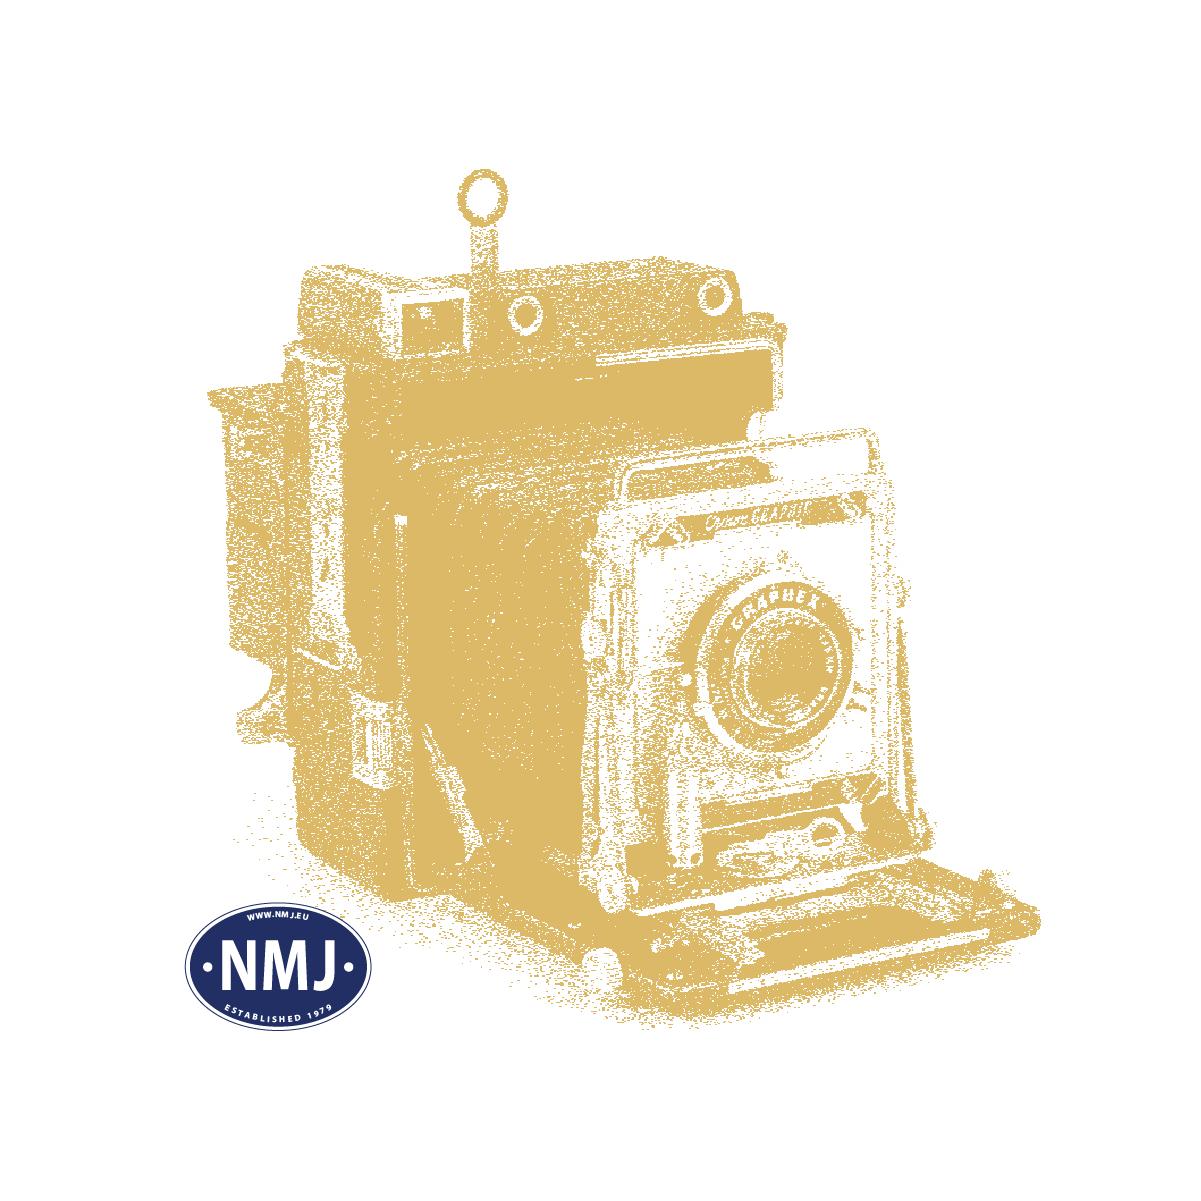 NMJT203.001 - NMJ Topline SJ ABo3K 5060, 1/2 Cl. Passenger coach, old SJ logo